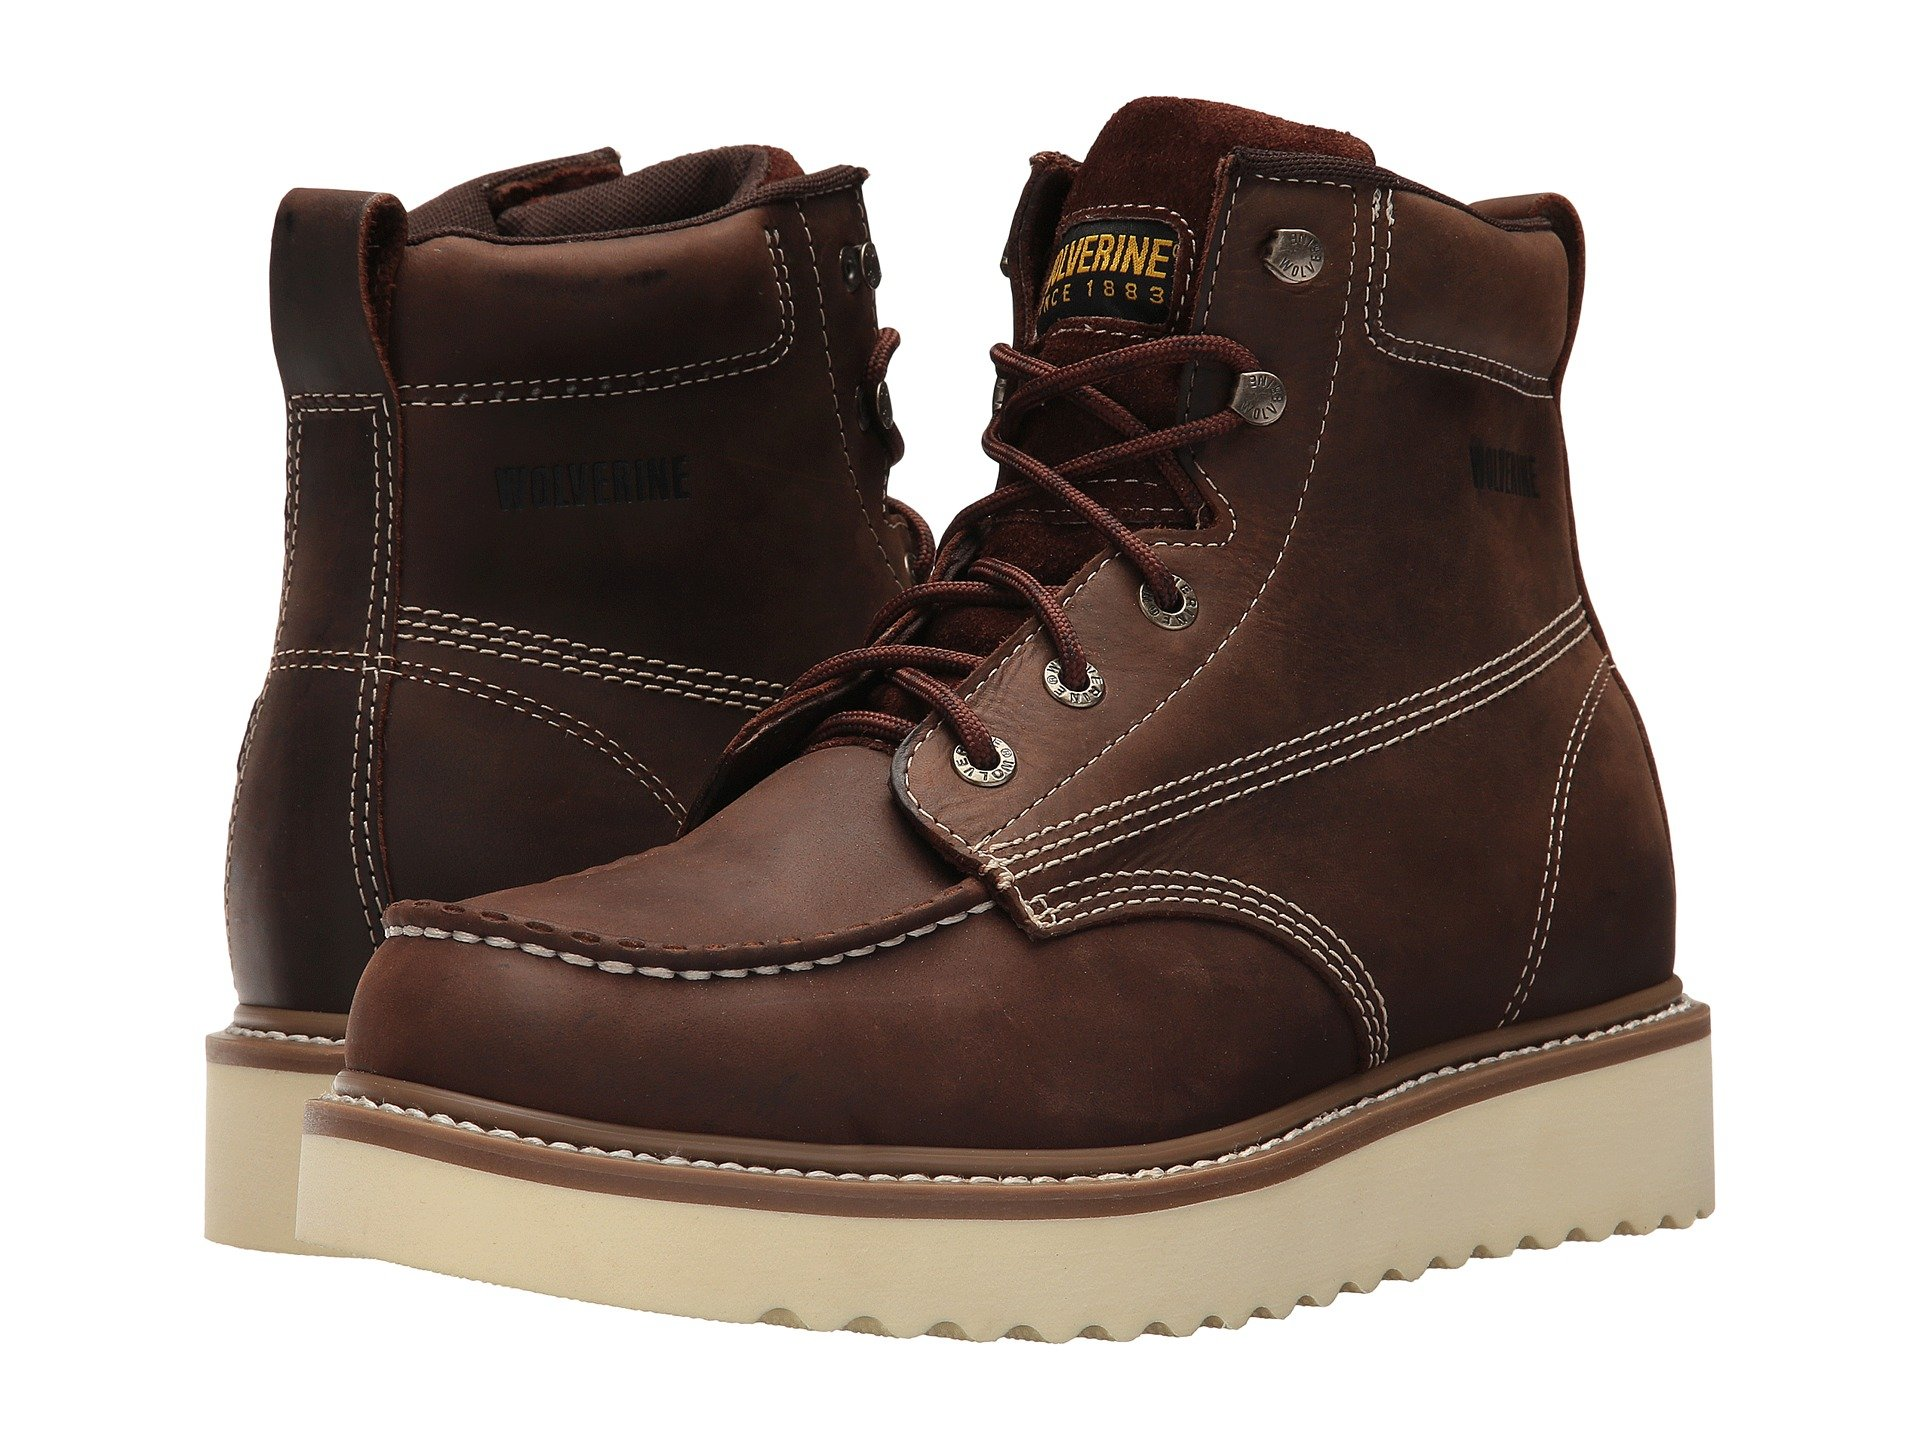 83274c8fb1b Men s Moc Toe Boots + FREE SHIPPING